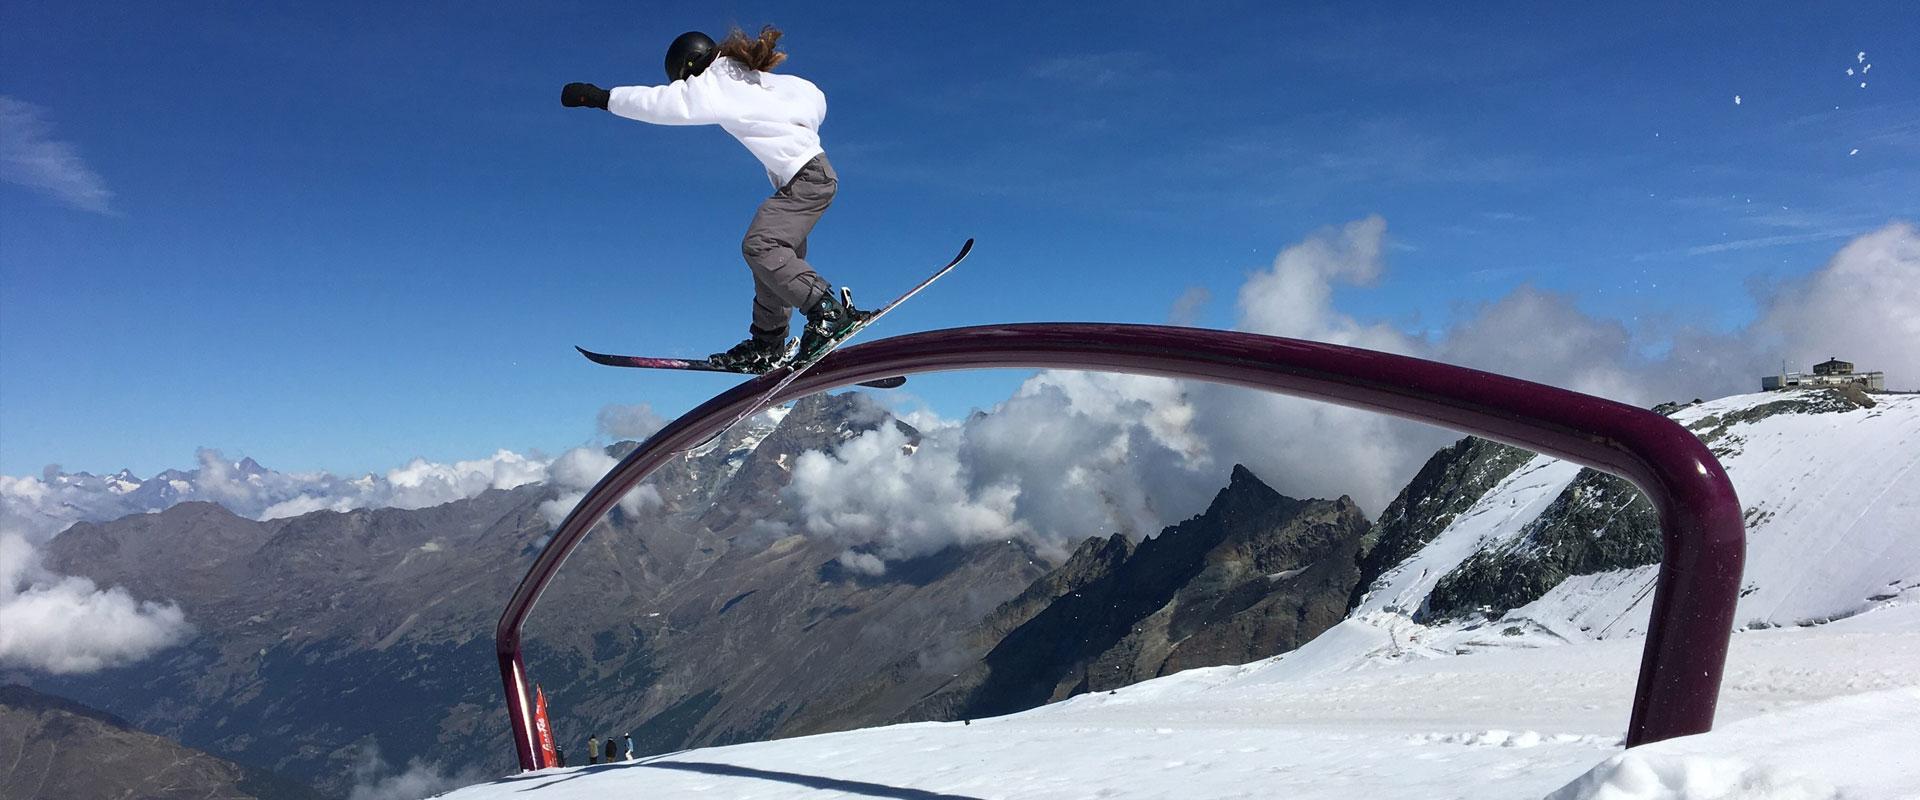 Training in Saas Fee, Switzerland